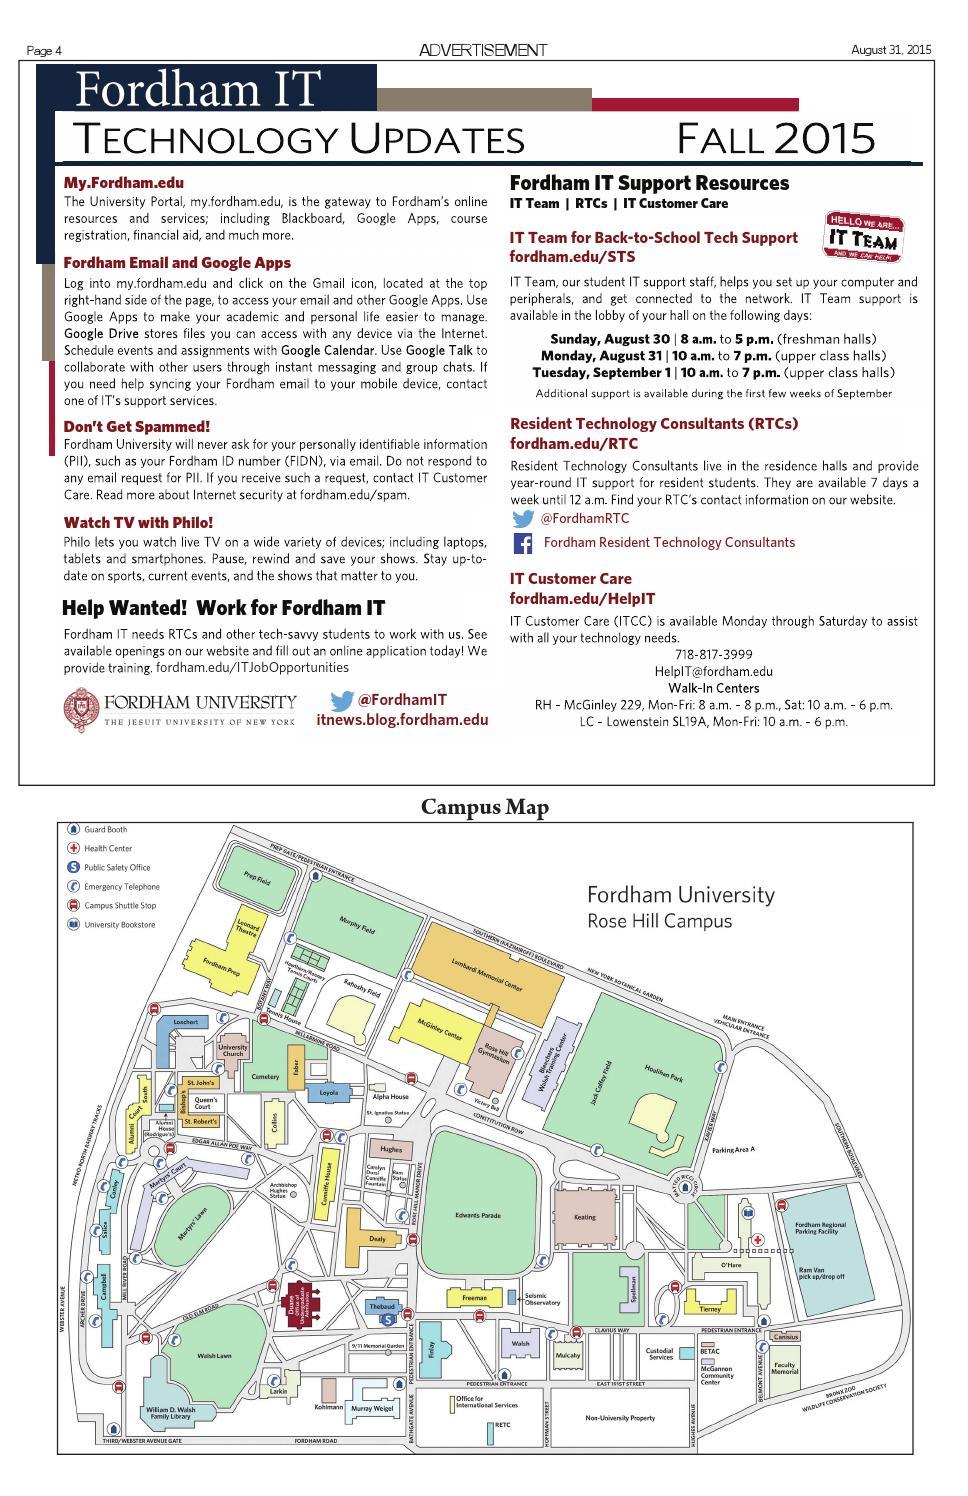 Campus Map Fordham.Volume 97 Orientation Issue By The Fordham Ram Issuu